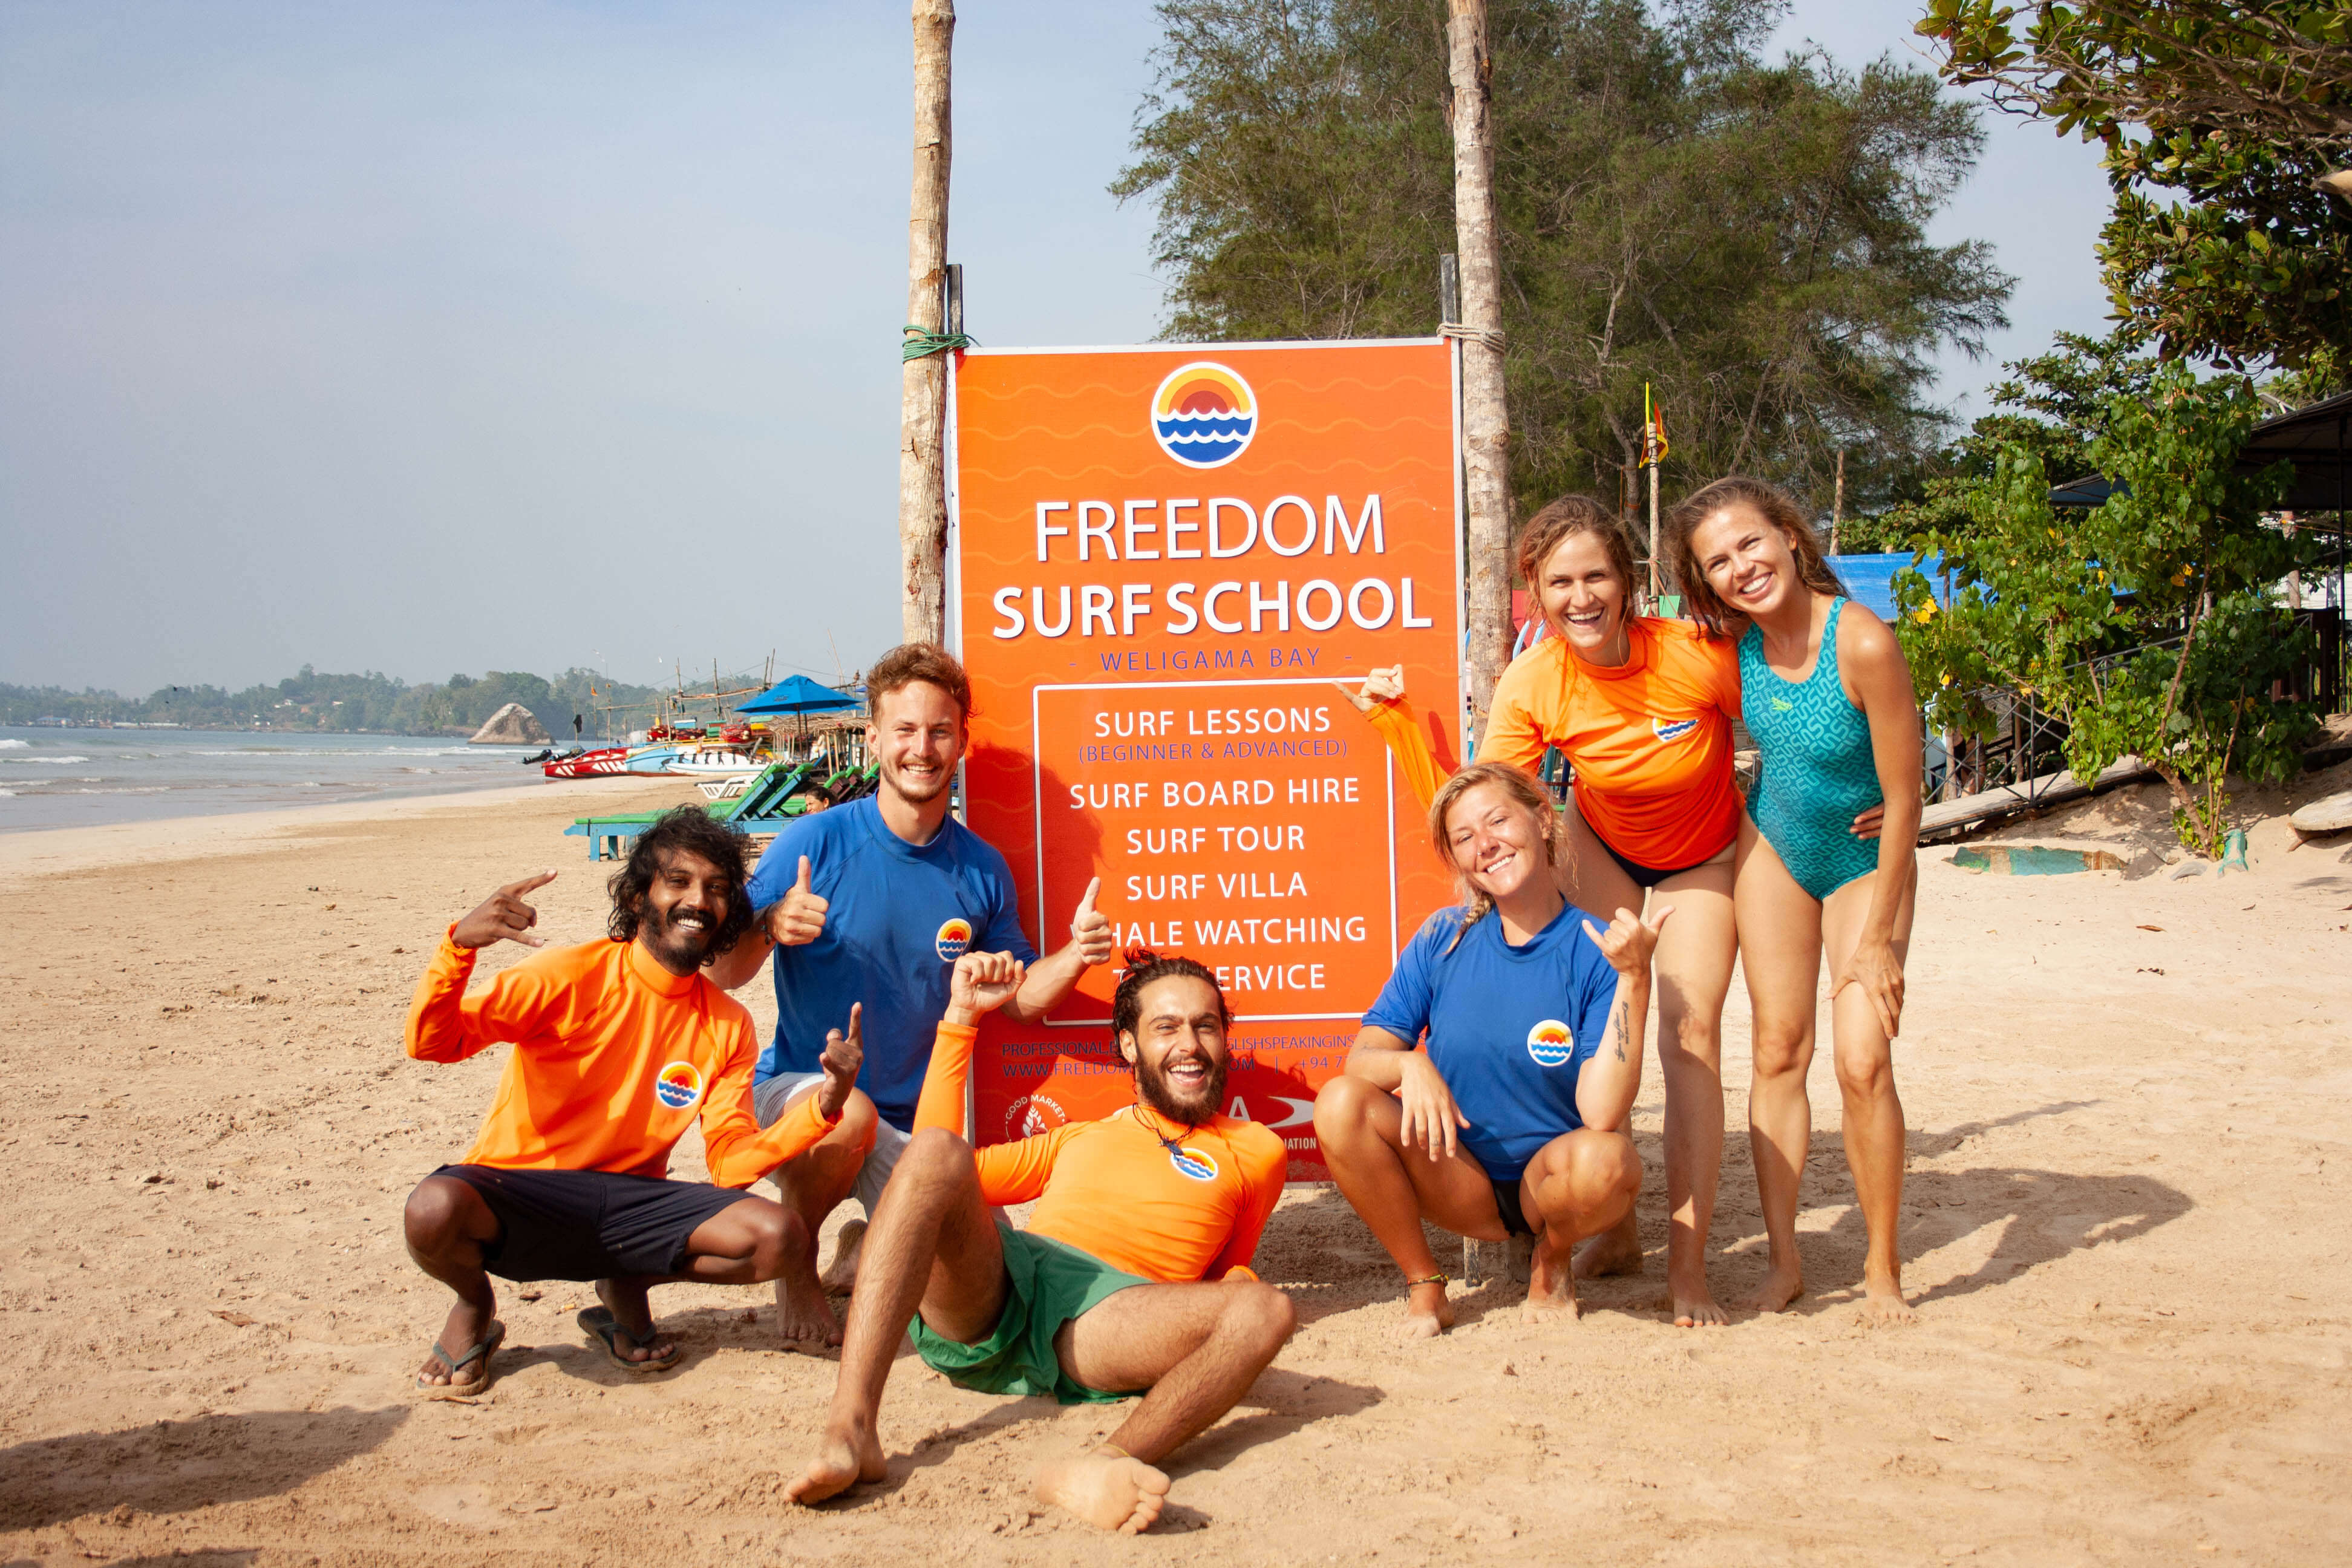 Surfcamp Freedom Surf School in Weligama, Matara, Sri Lanka